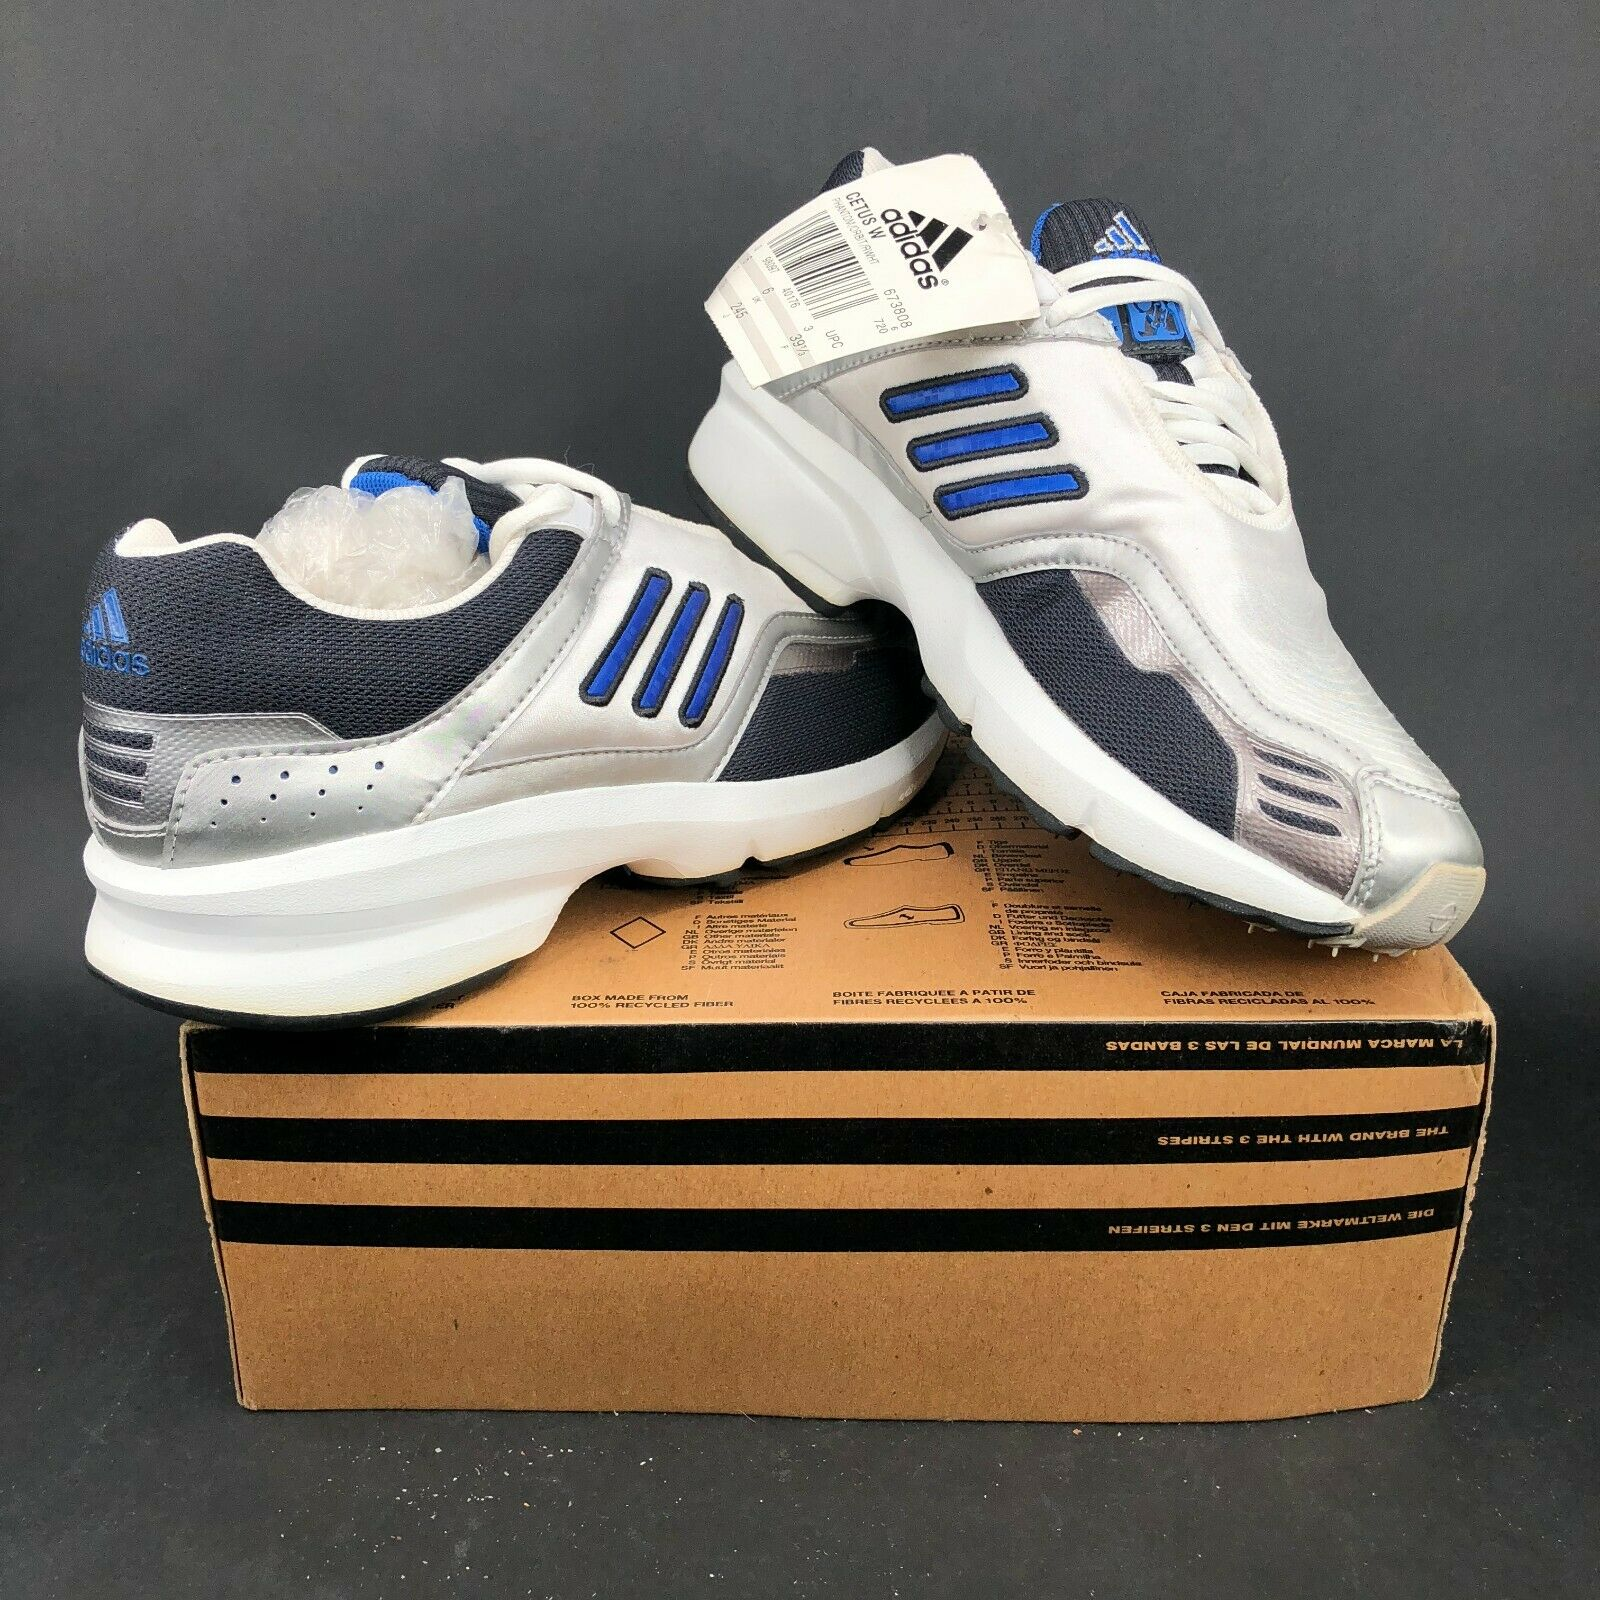 Adidas Cetus W con Cordones blancoo Plata Azul Running Zapatos para hombre 9 2000s 2001 Rara